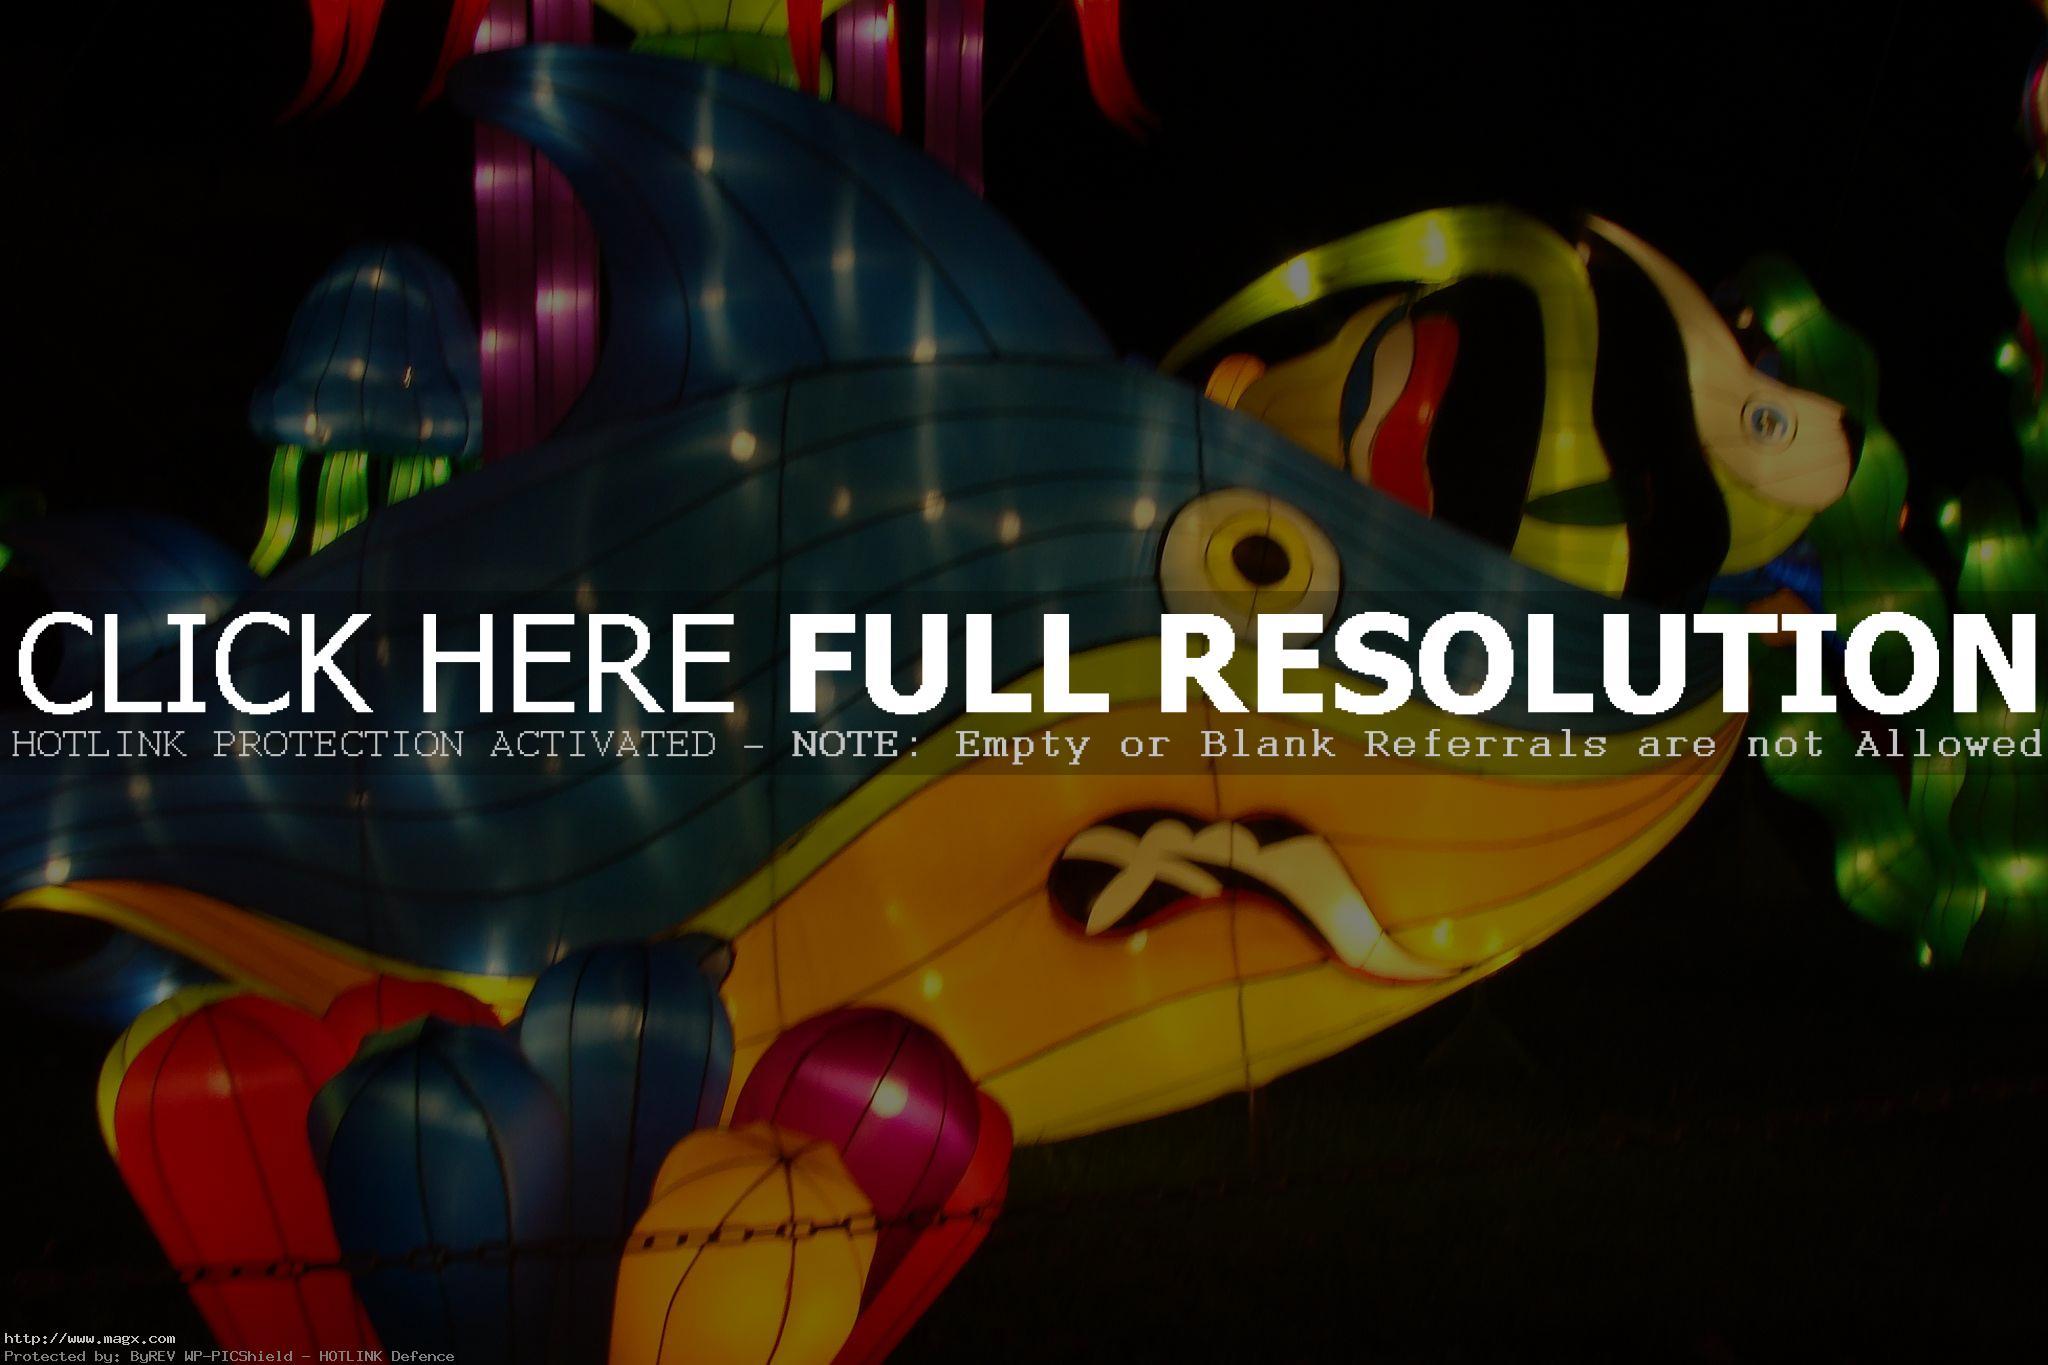 chinese lantern festival10 Chinese Lantern Festival 2016 in Spokane, Washington